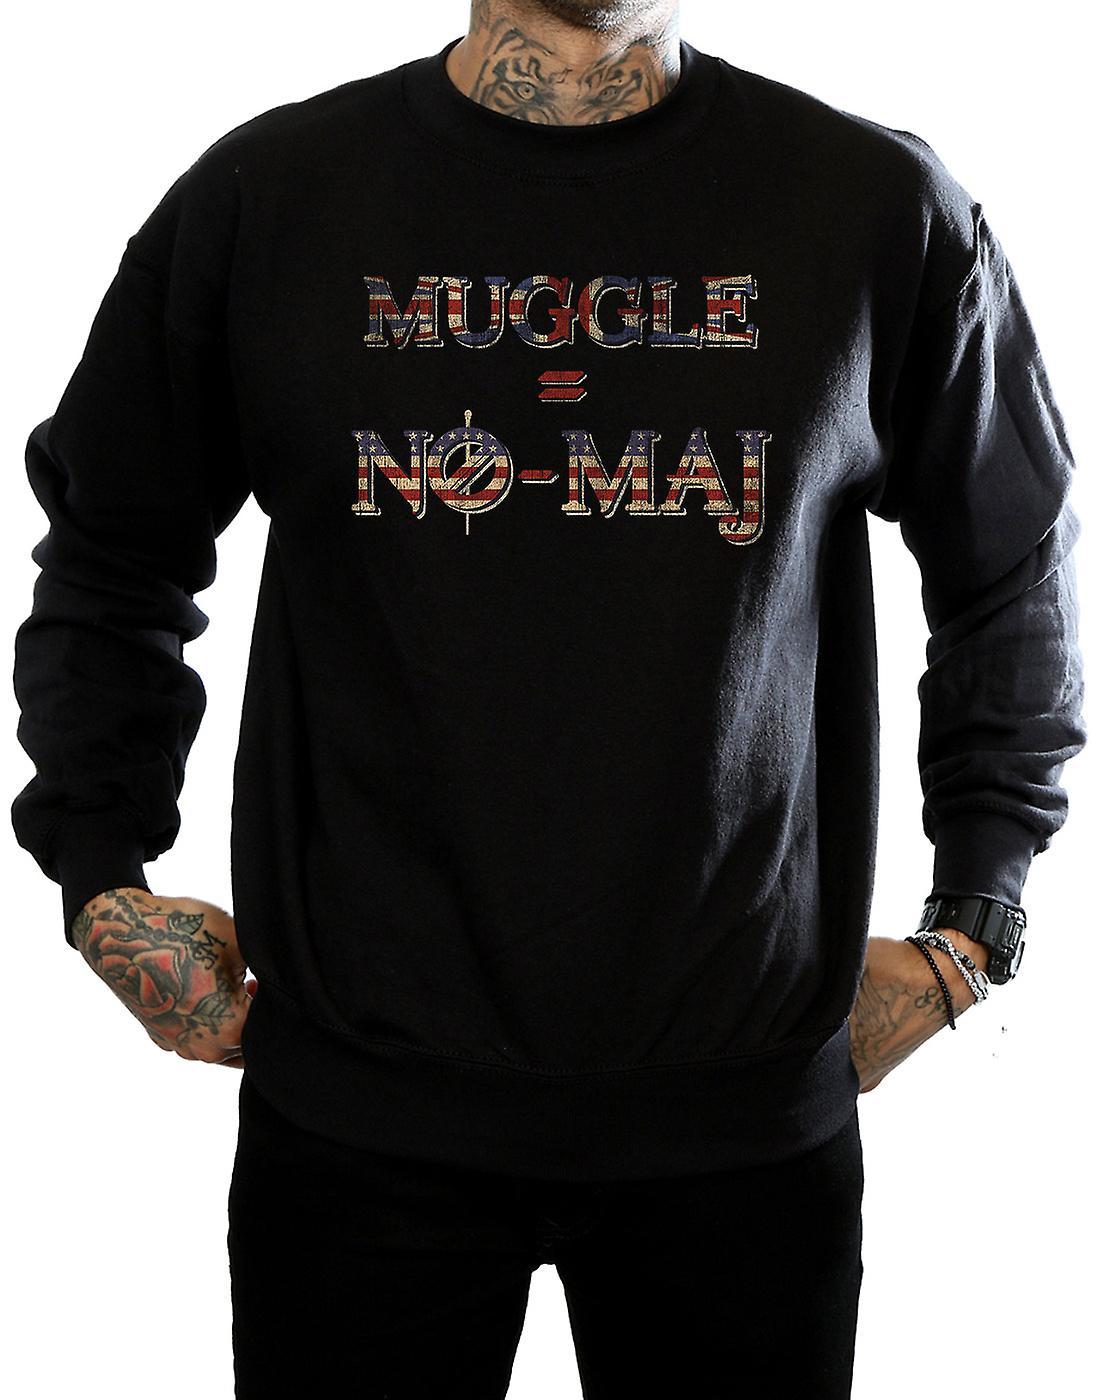 Fantastic Beasts Men's No Muggle No Maj Sweatshirt